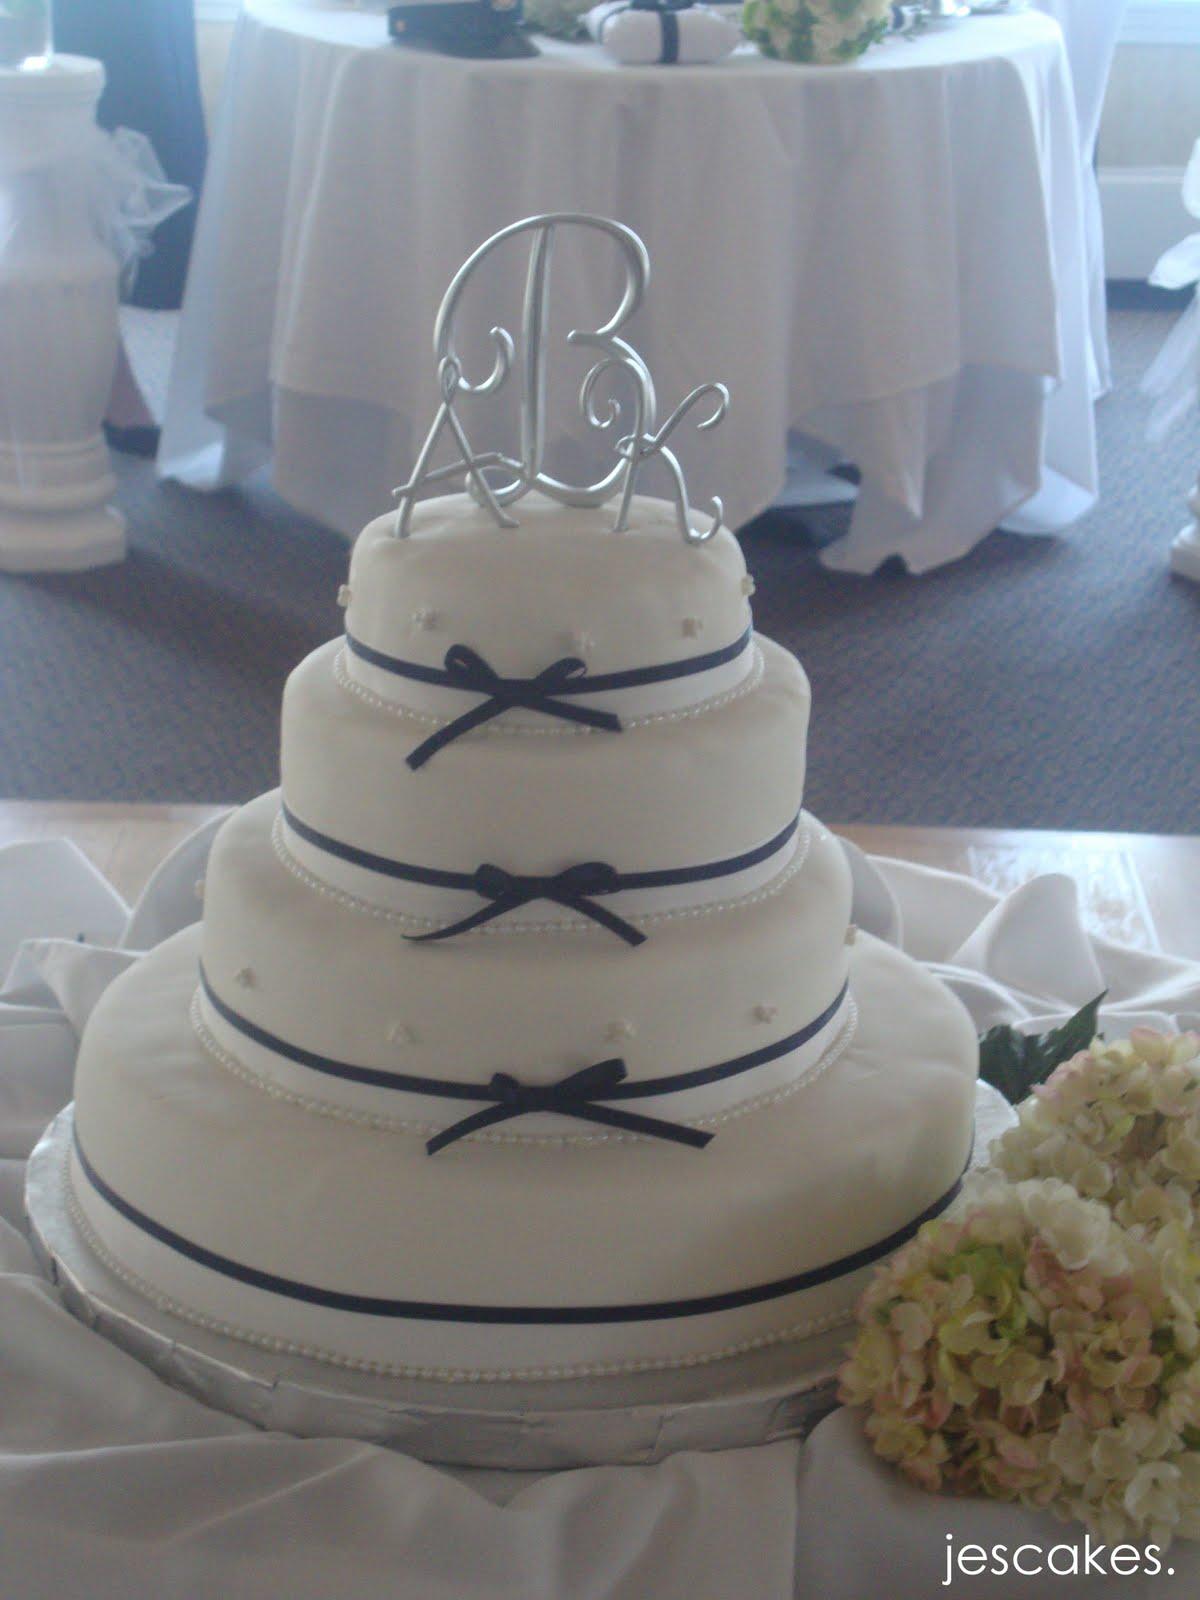 Jes Cakes Cake Gallery